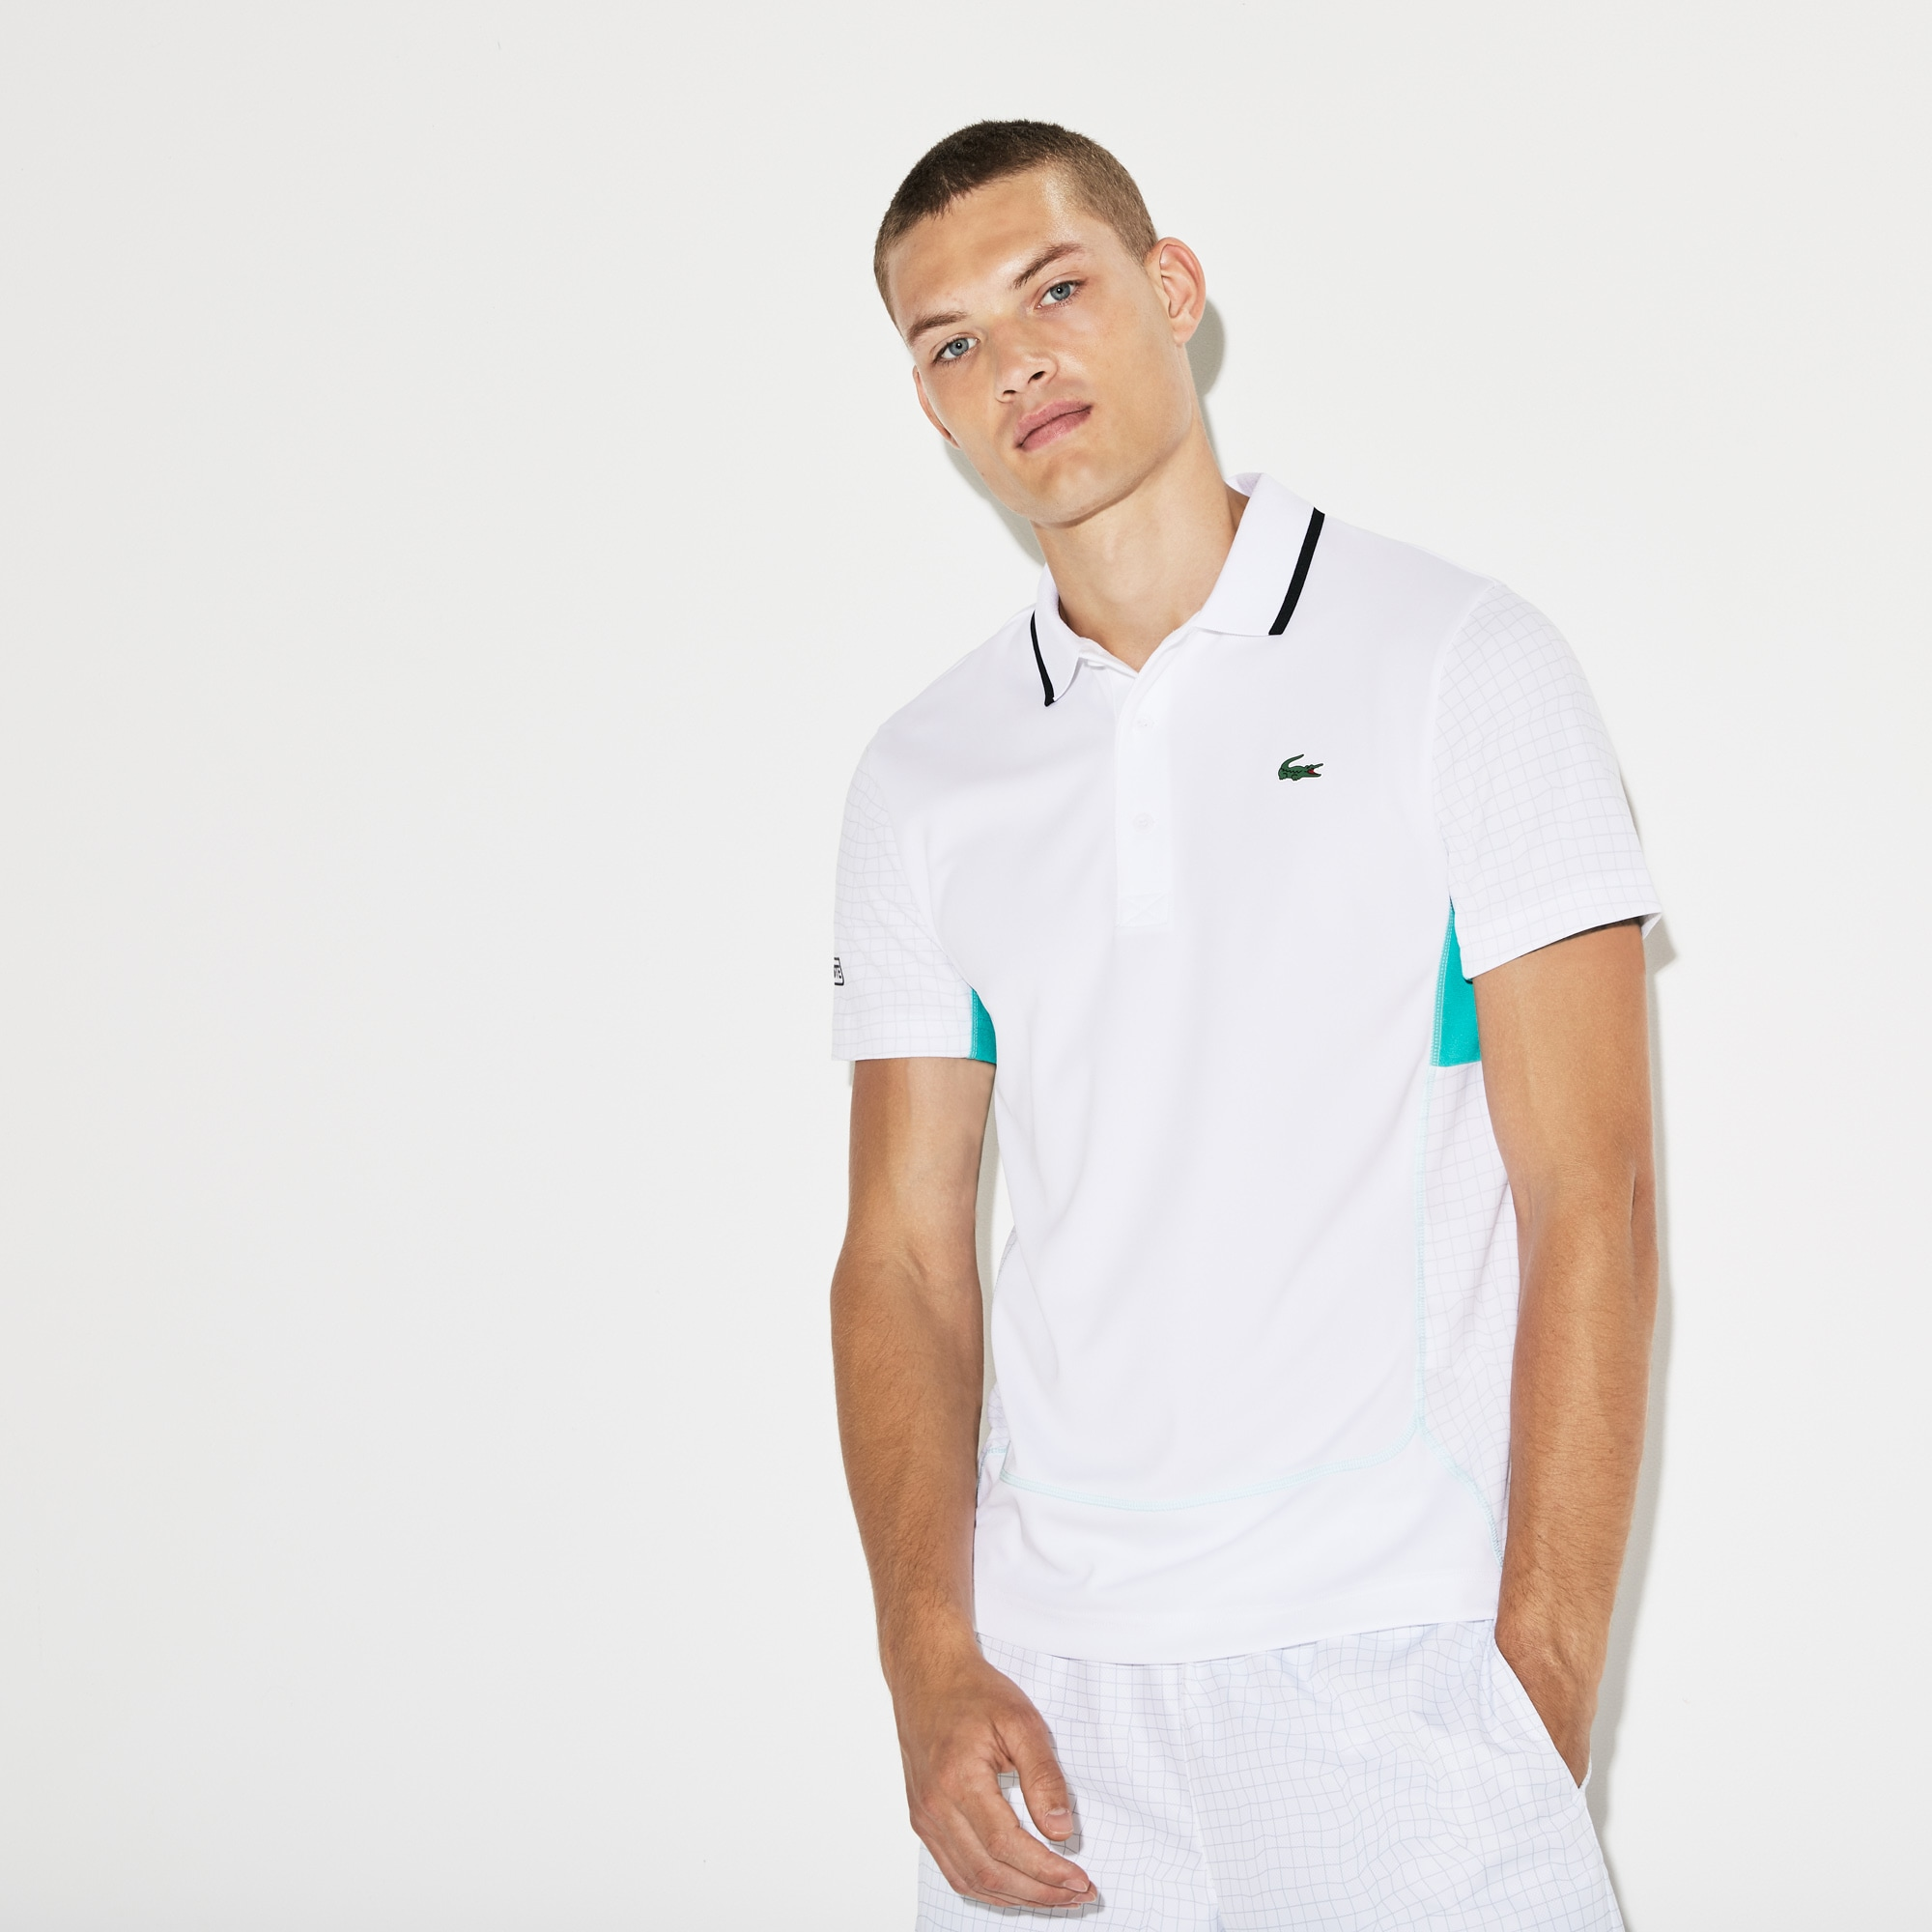 Polo Tennis Lacoste SPORT in piqué tecnico tinta unita e stampa a rete